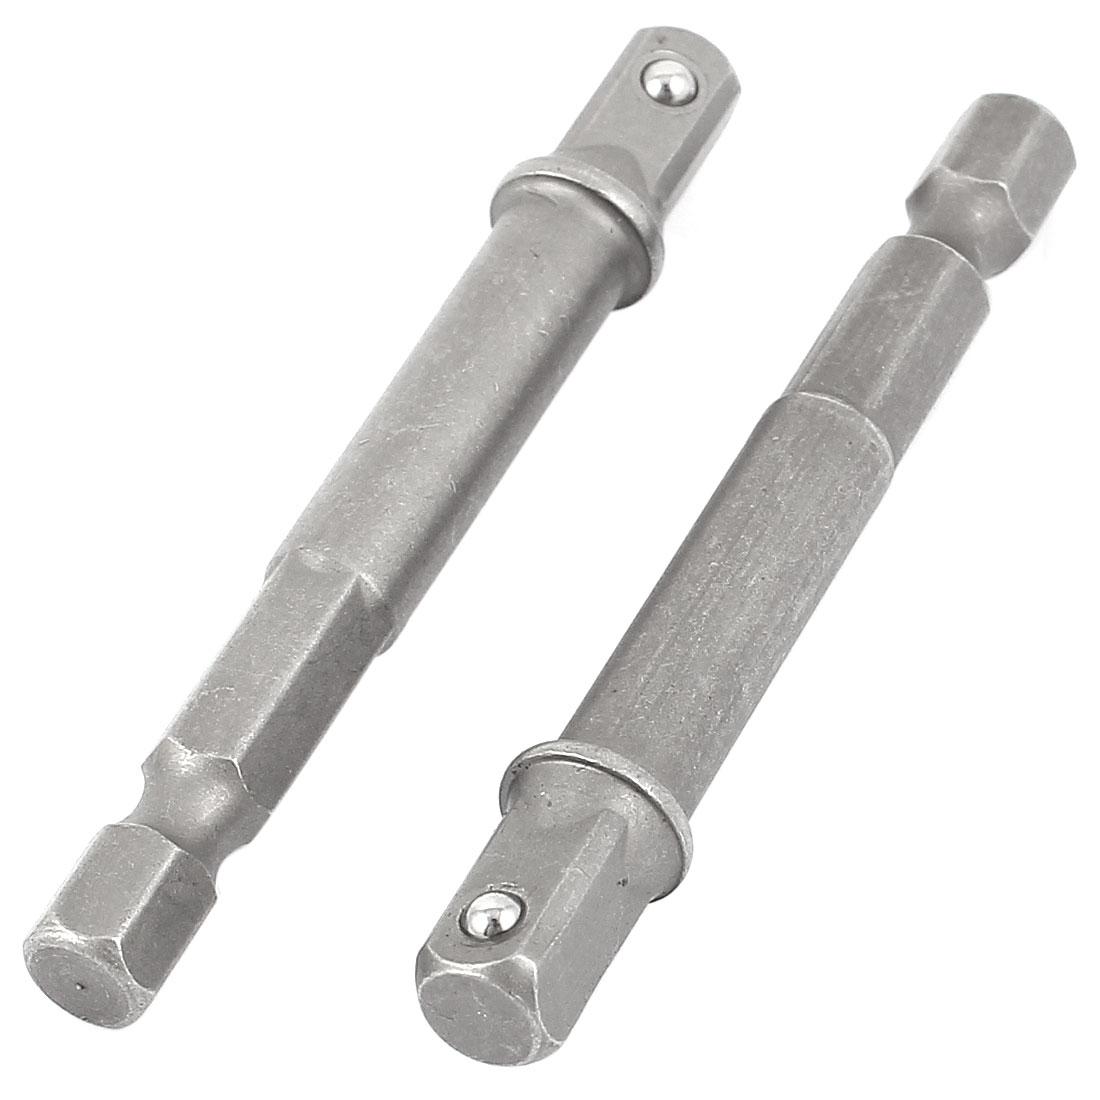 "65mm Long 1/4"" Hex Shank Driver Bit Nut Setter Socket Adapter 2PCS"